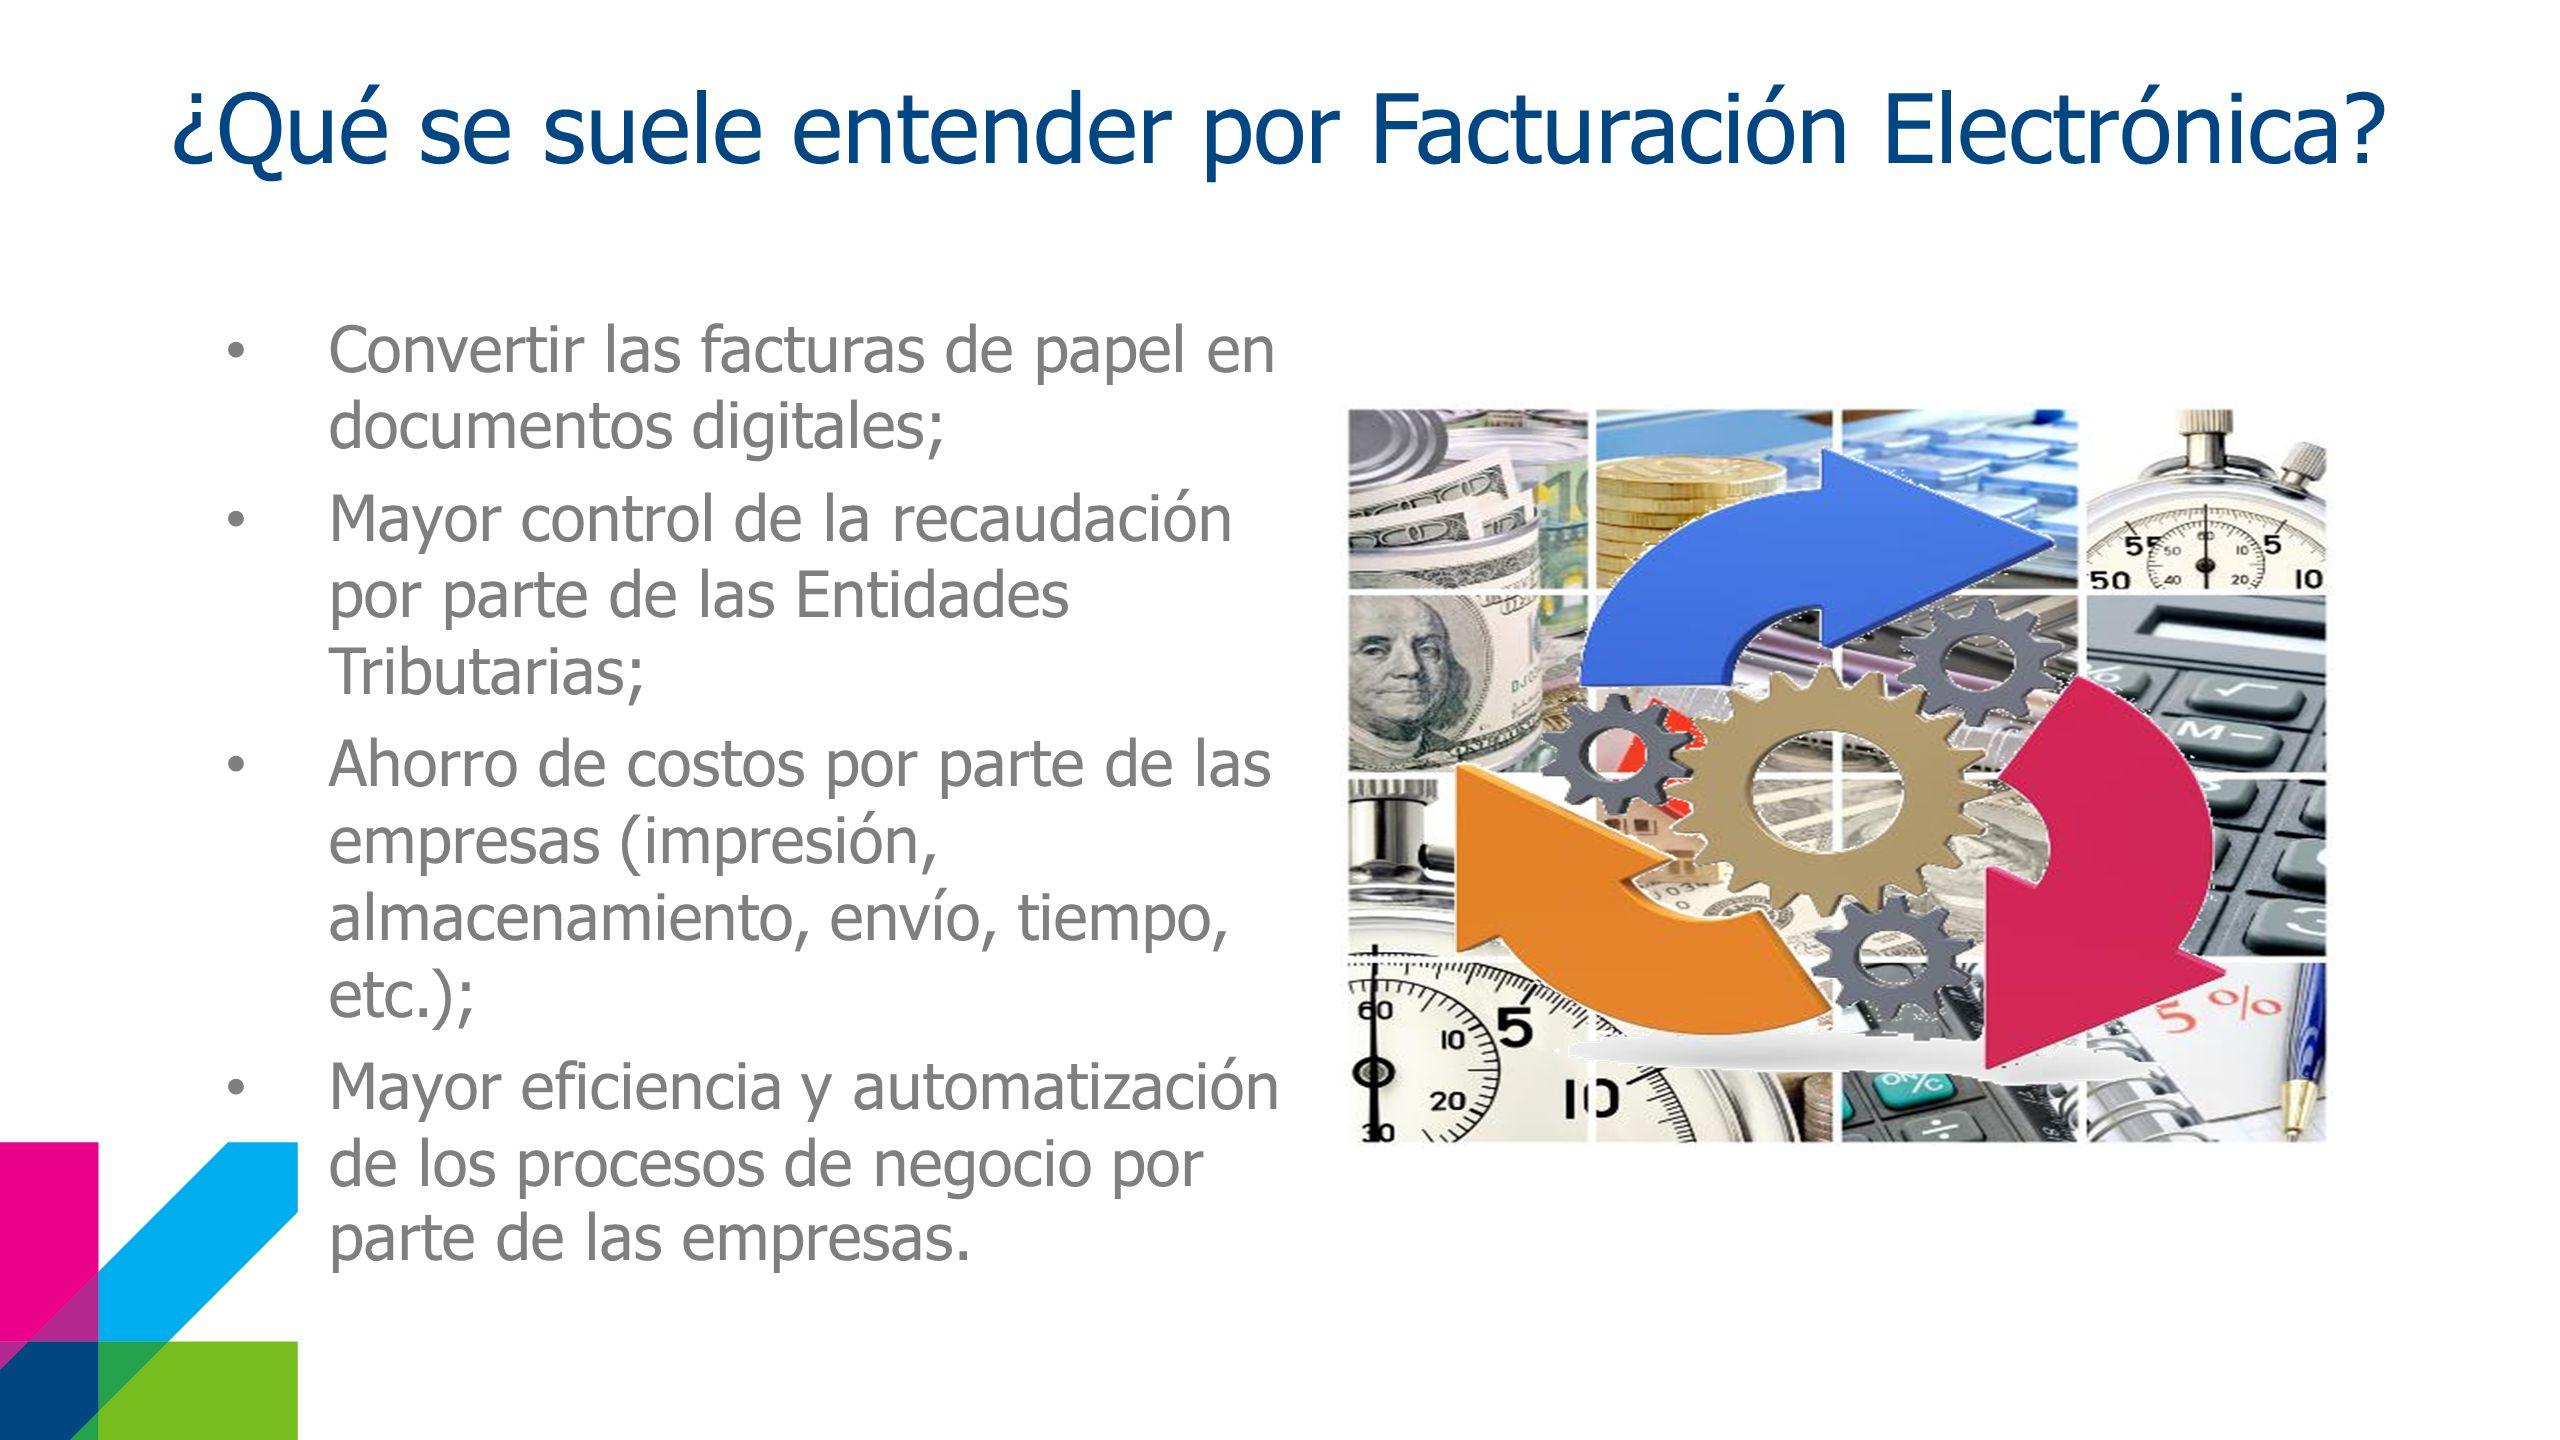 ¿Qué se suele entender por Facturación Electrónica